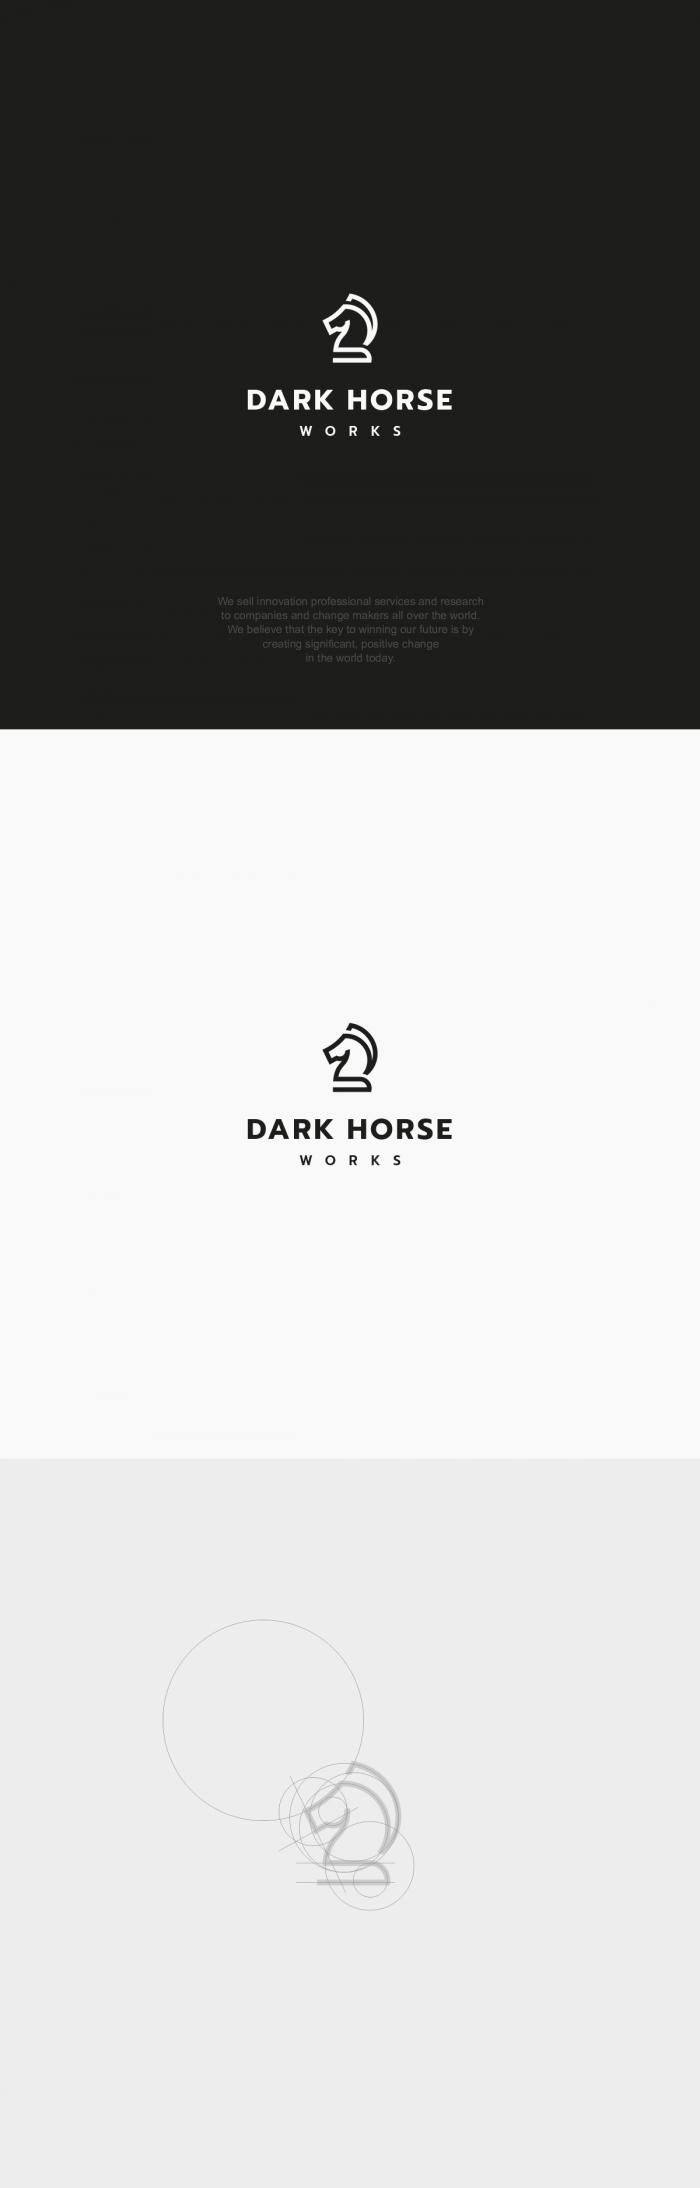 line art logo exemple tendance 2020 conseil graphiste